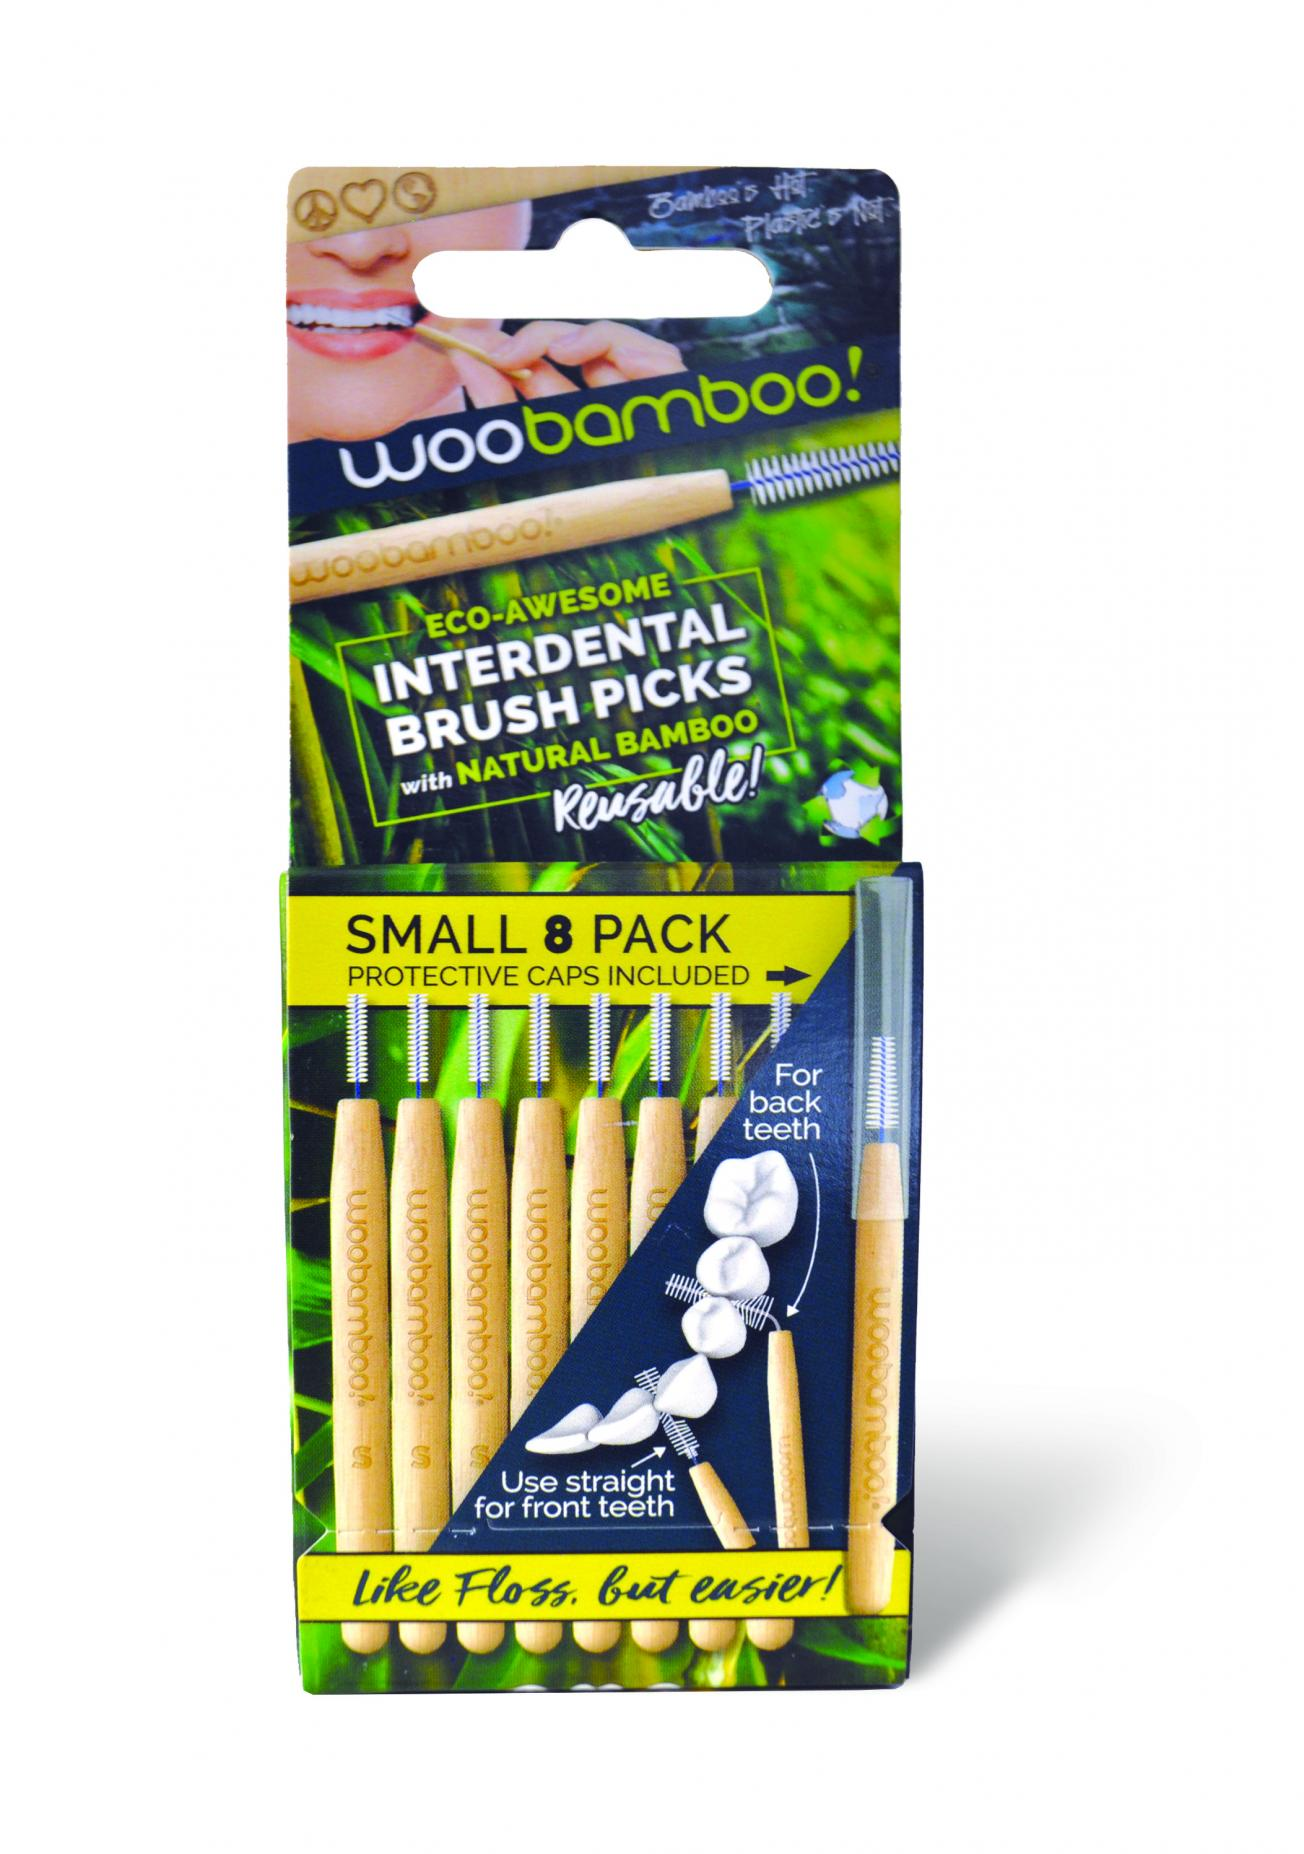 Interdental Brush Picks Small